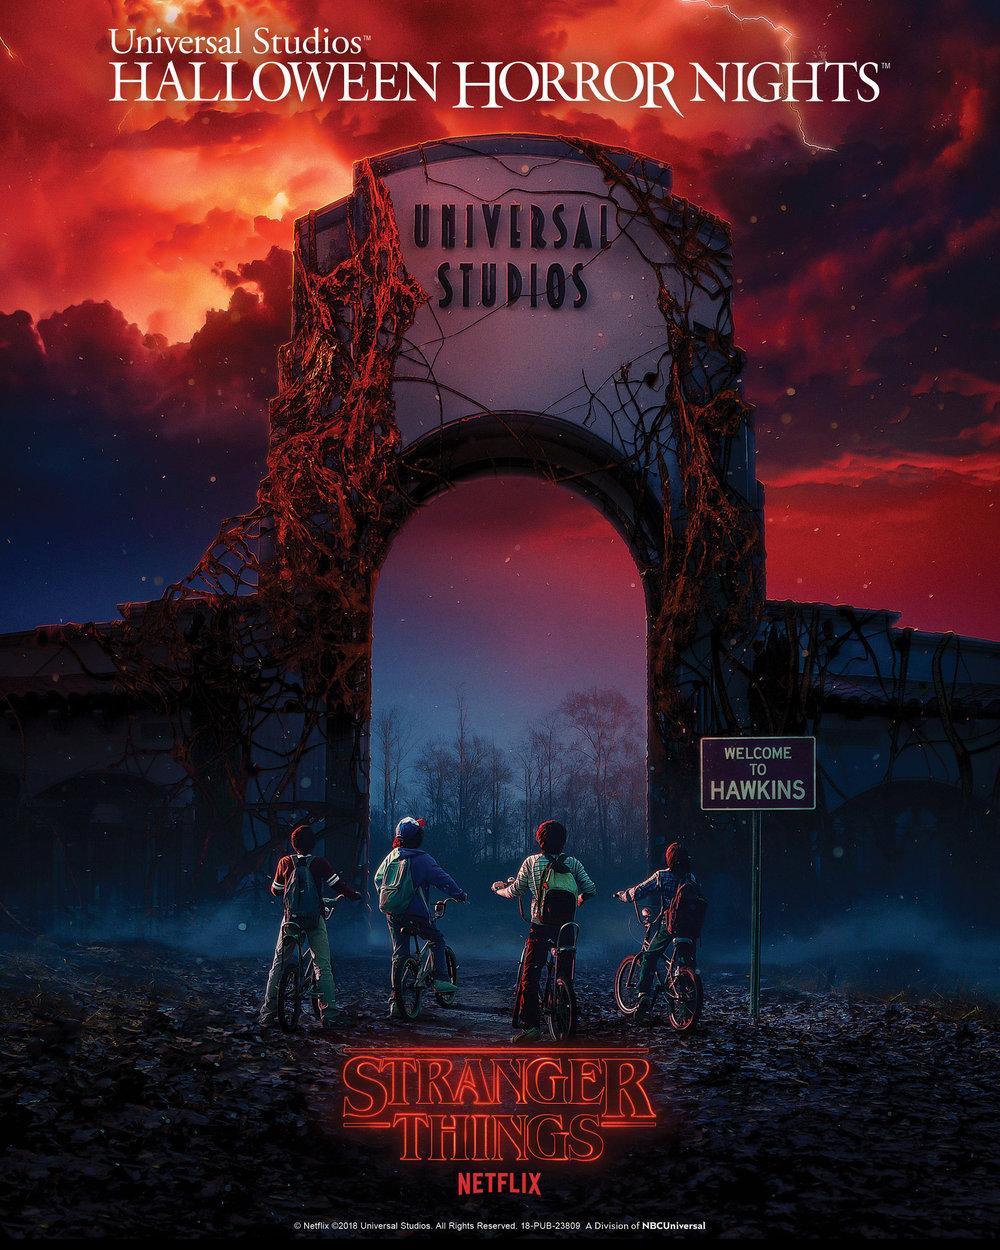 stranger-things-is-coming-to-universal-studios-halloween-horror-nights1